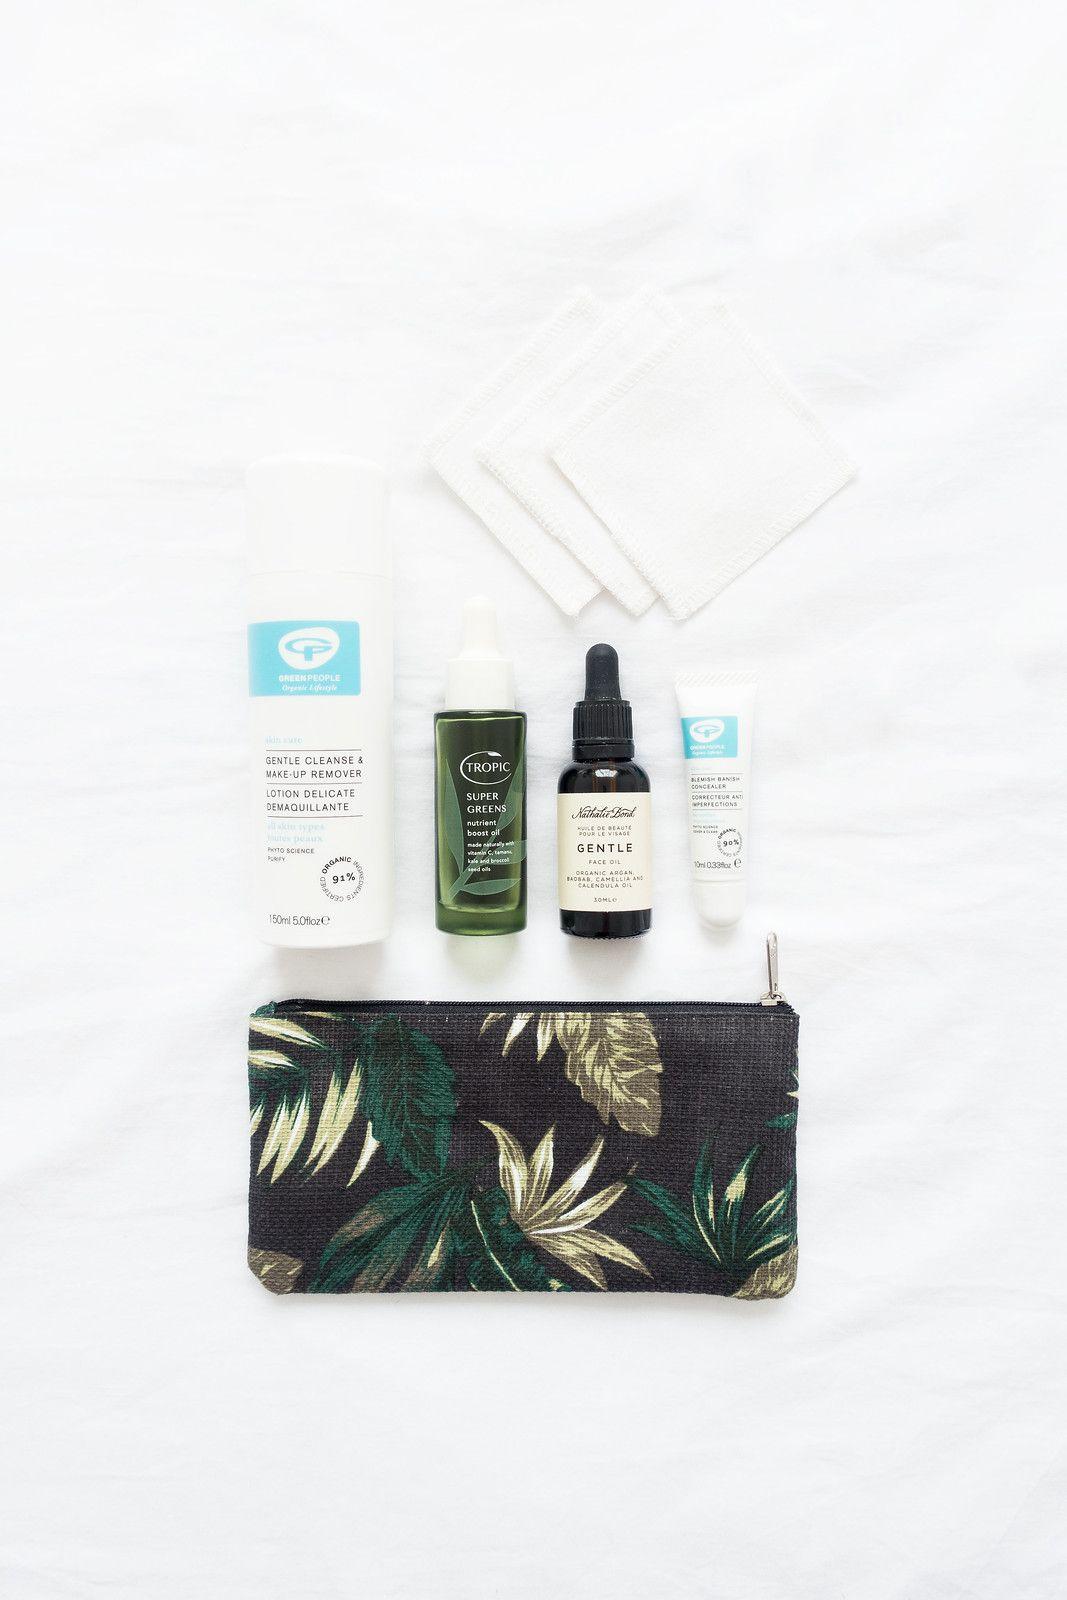 CrueltyFree Brands To Try Skincare Cruelty free brands